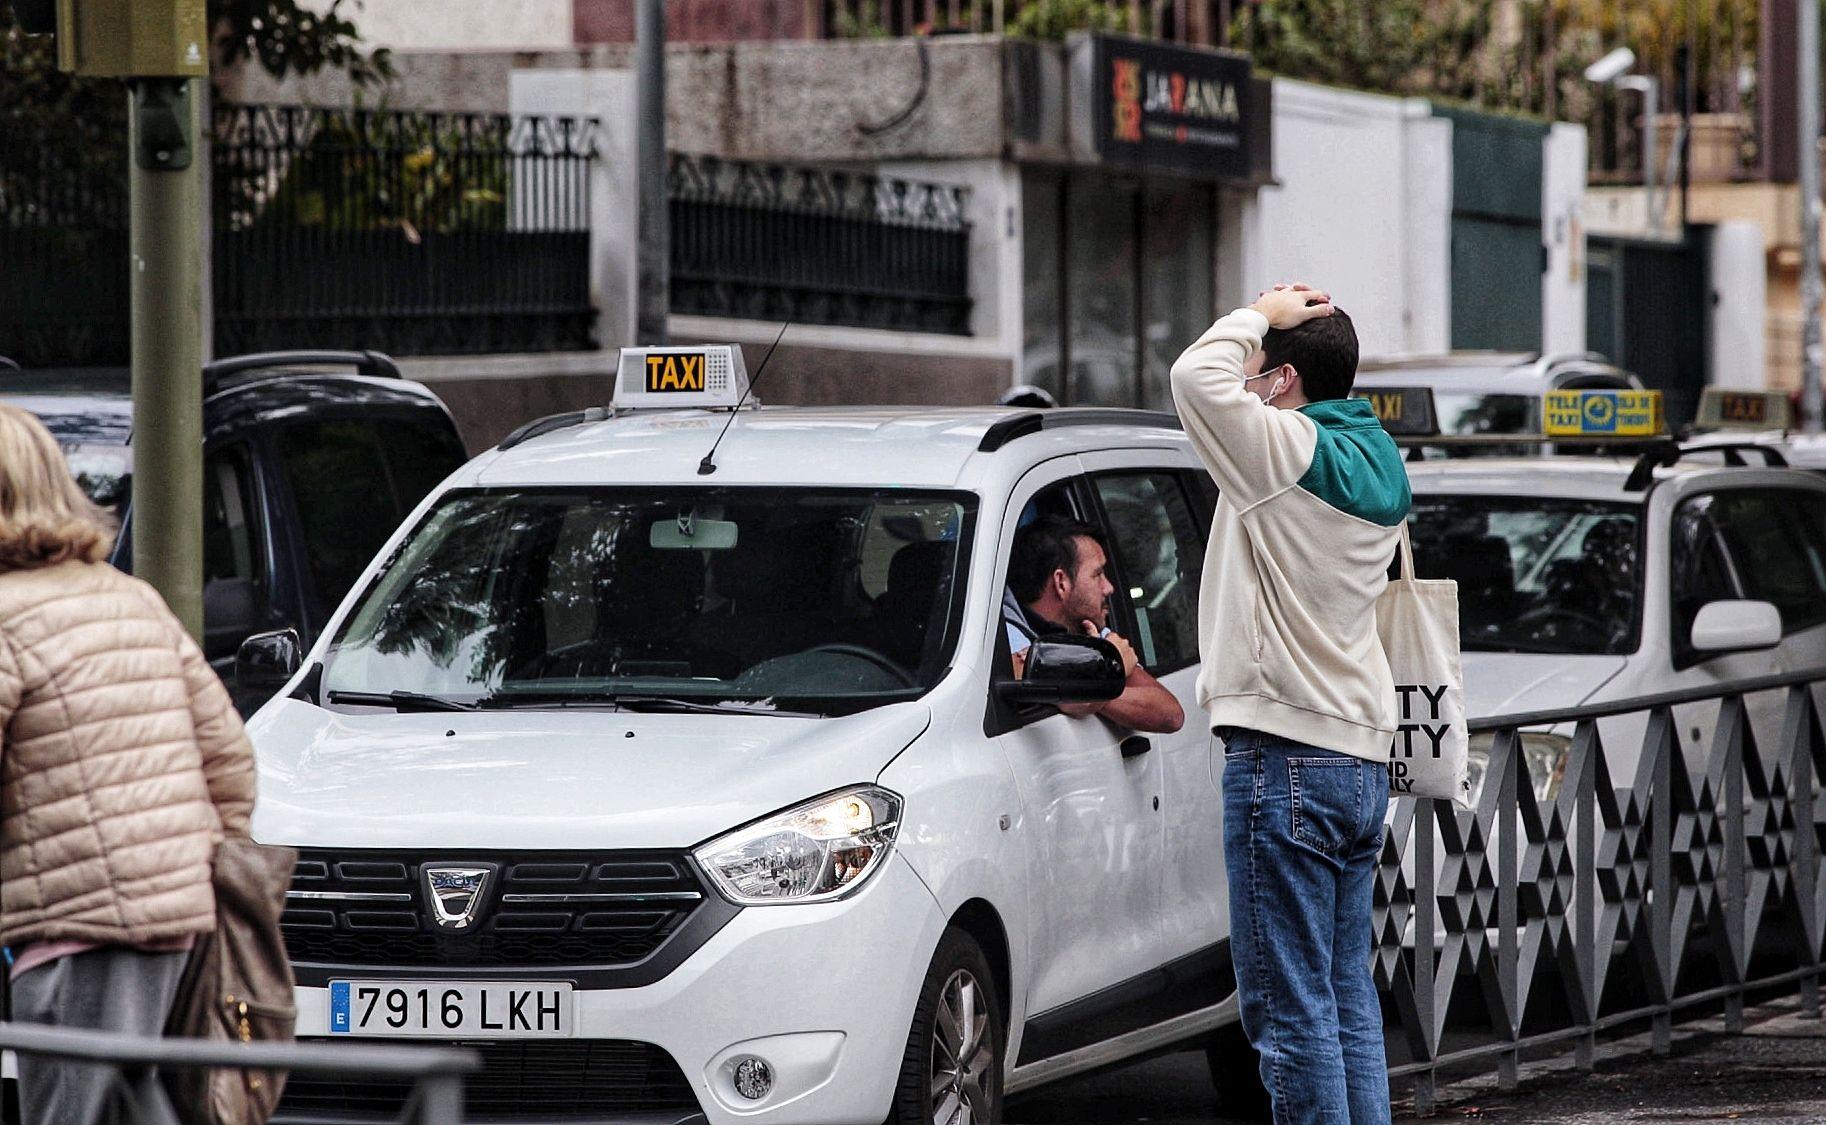 Caravana de taxis en Santa Cruz de Tenerife